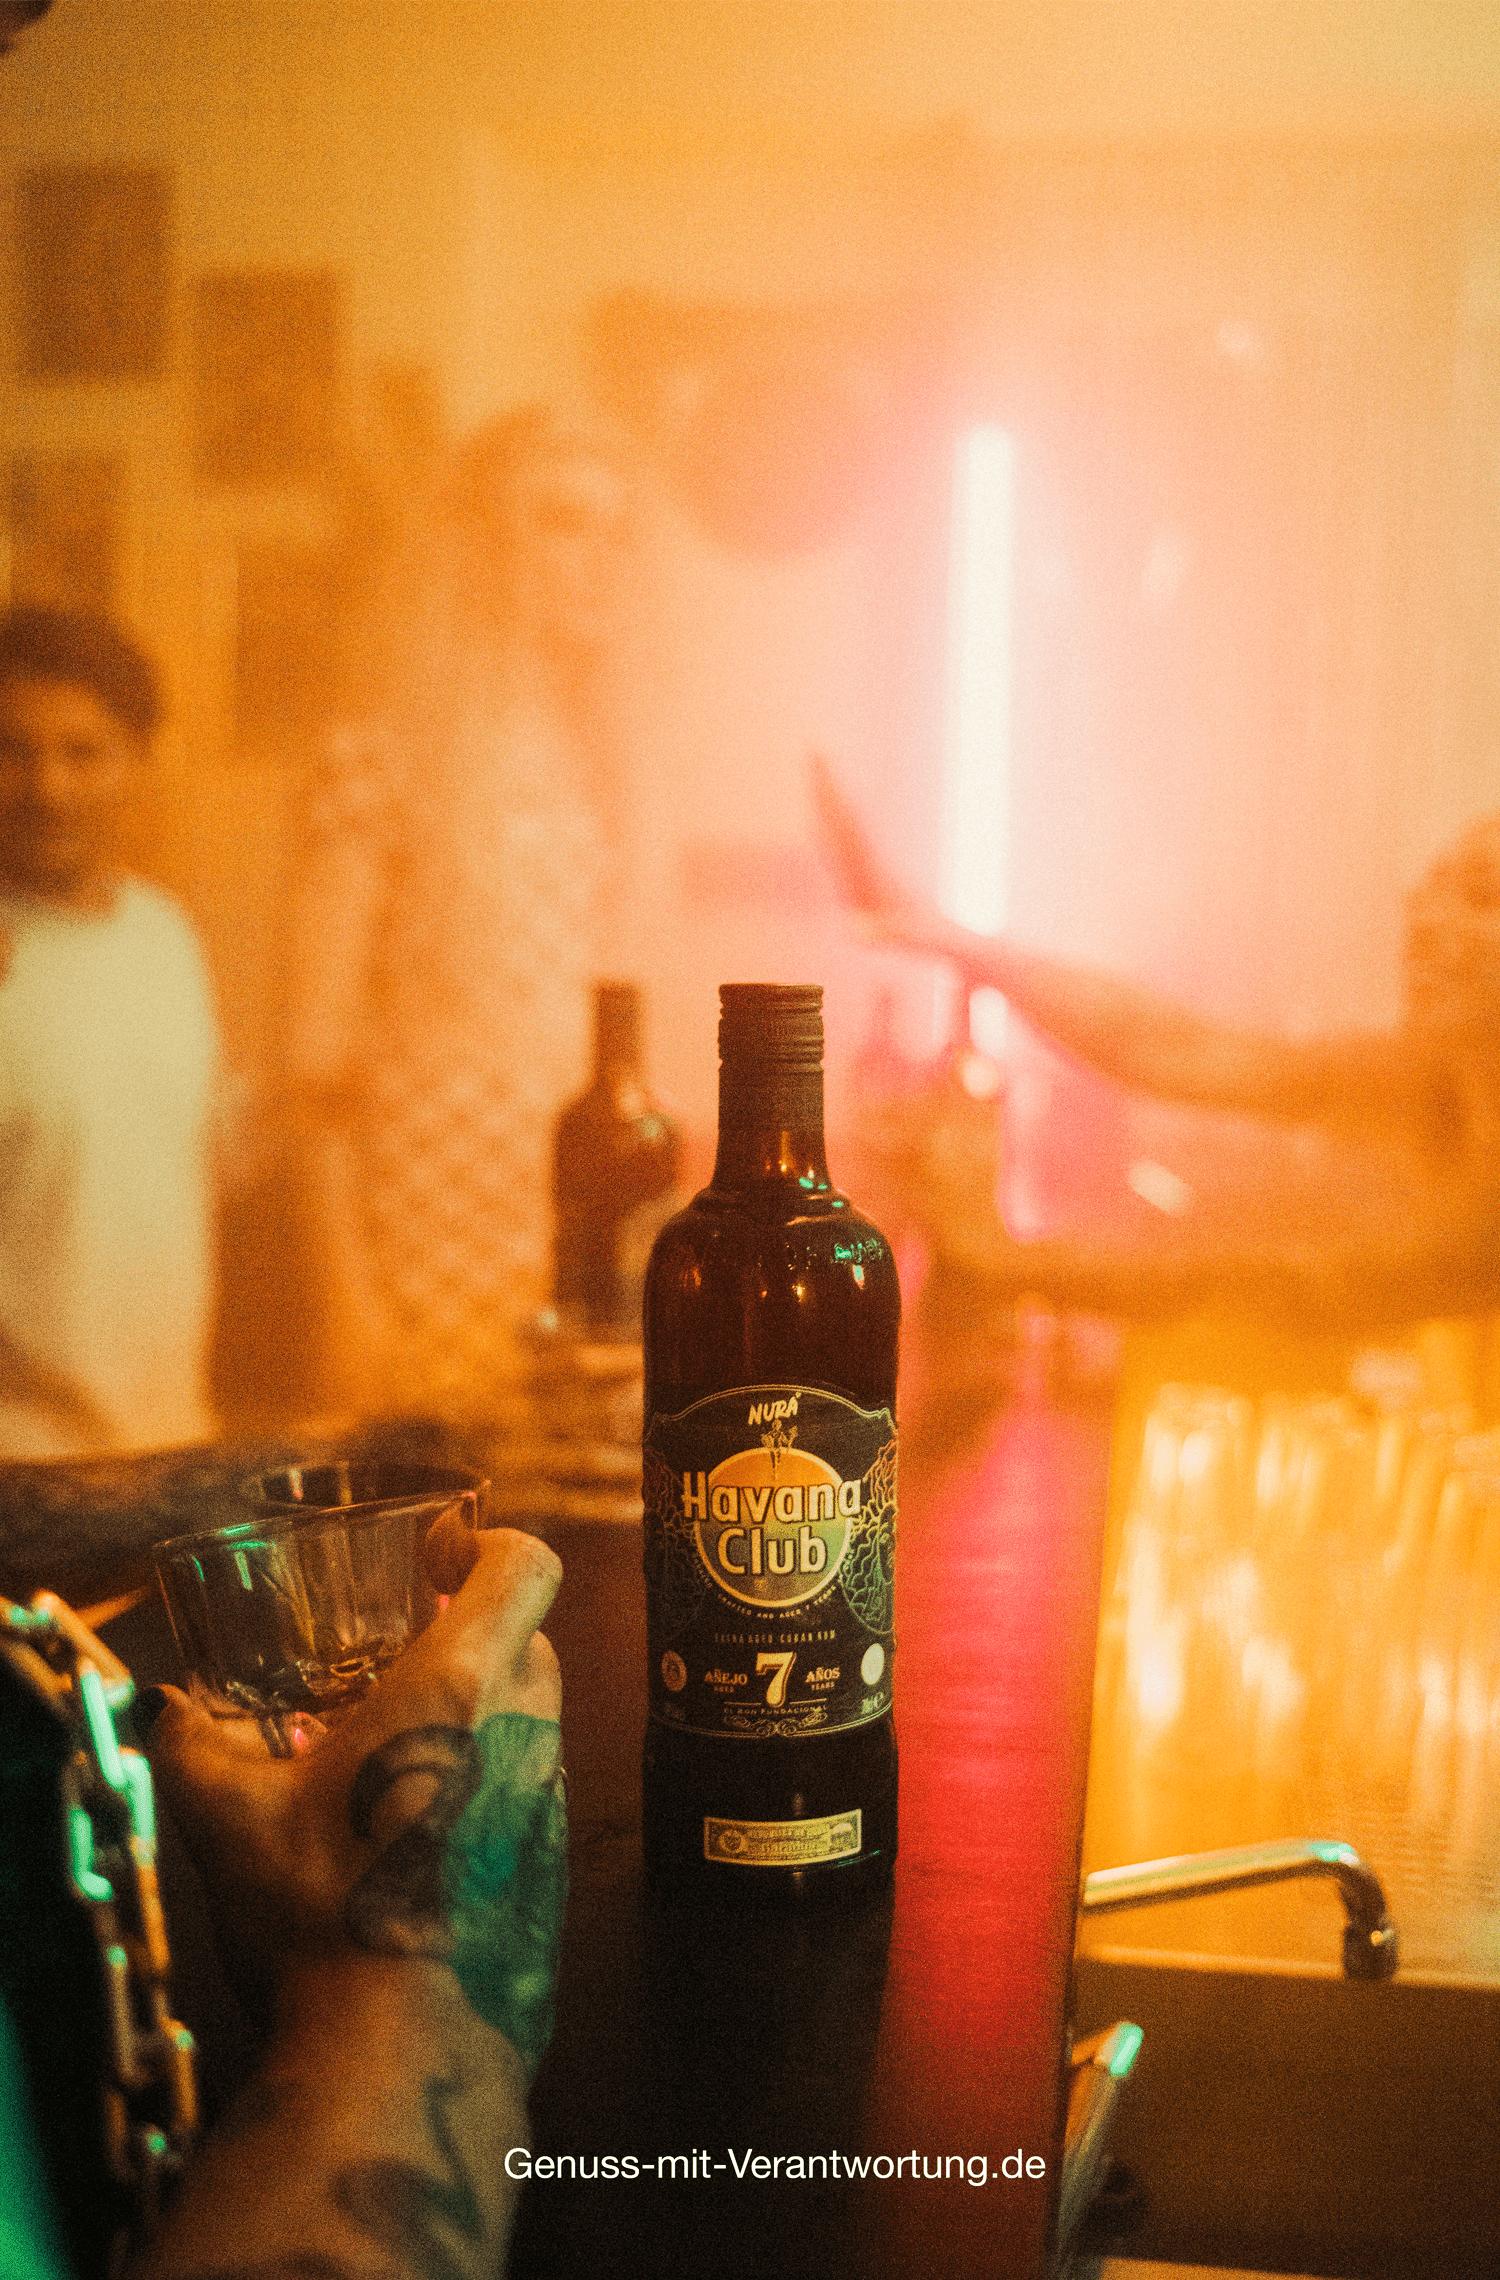 Havana Club x Nura Limited Edition 2021